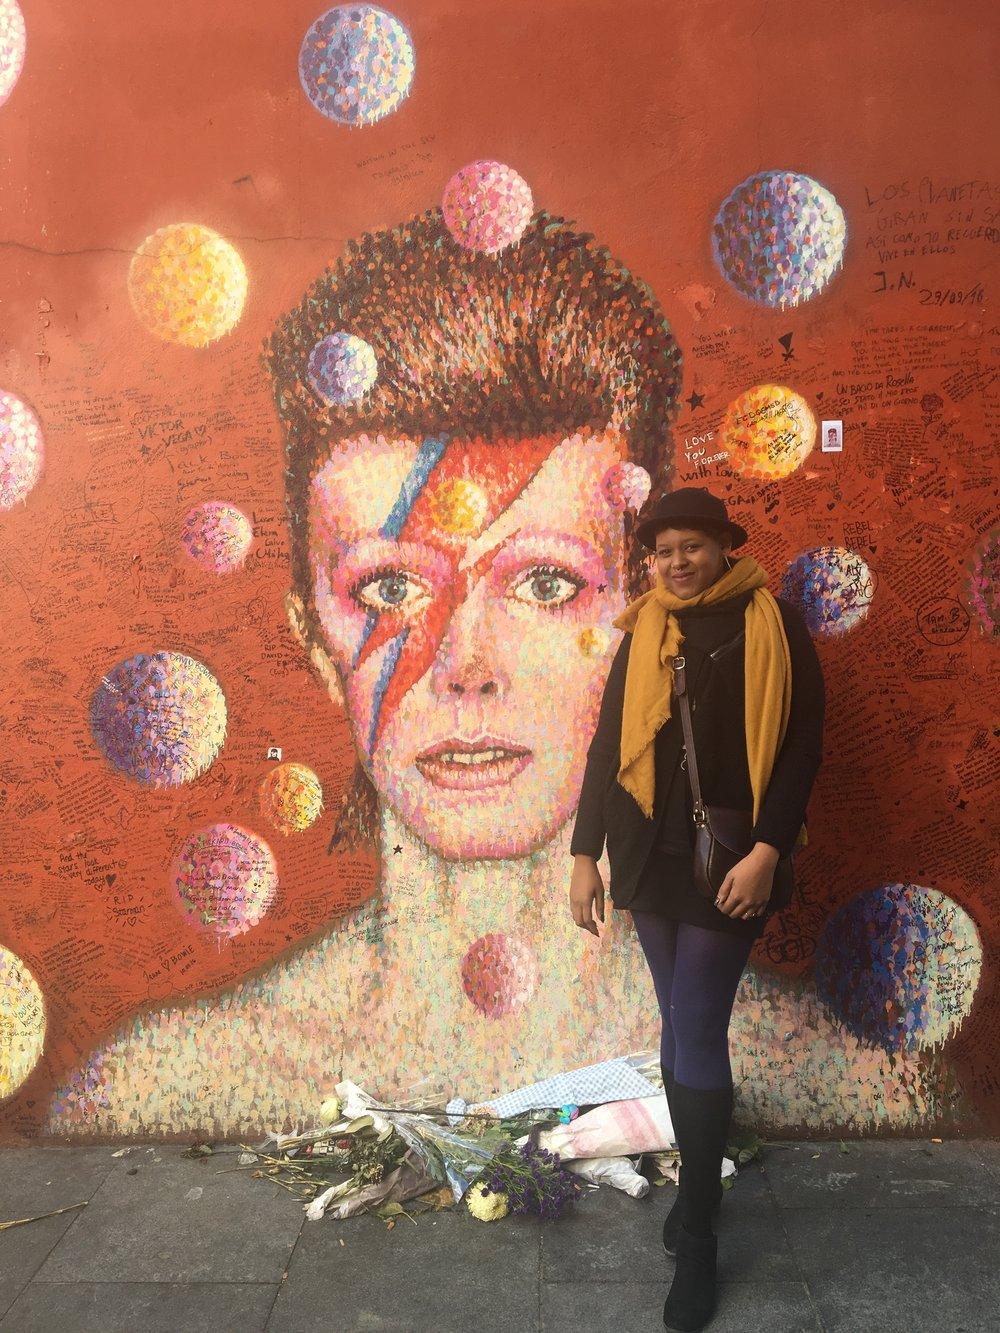 David Bowie Mural - Brixton, London, UK October 18, 2016